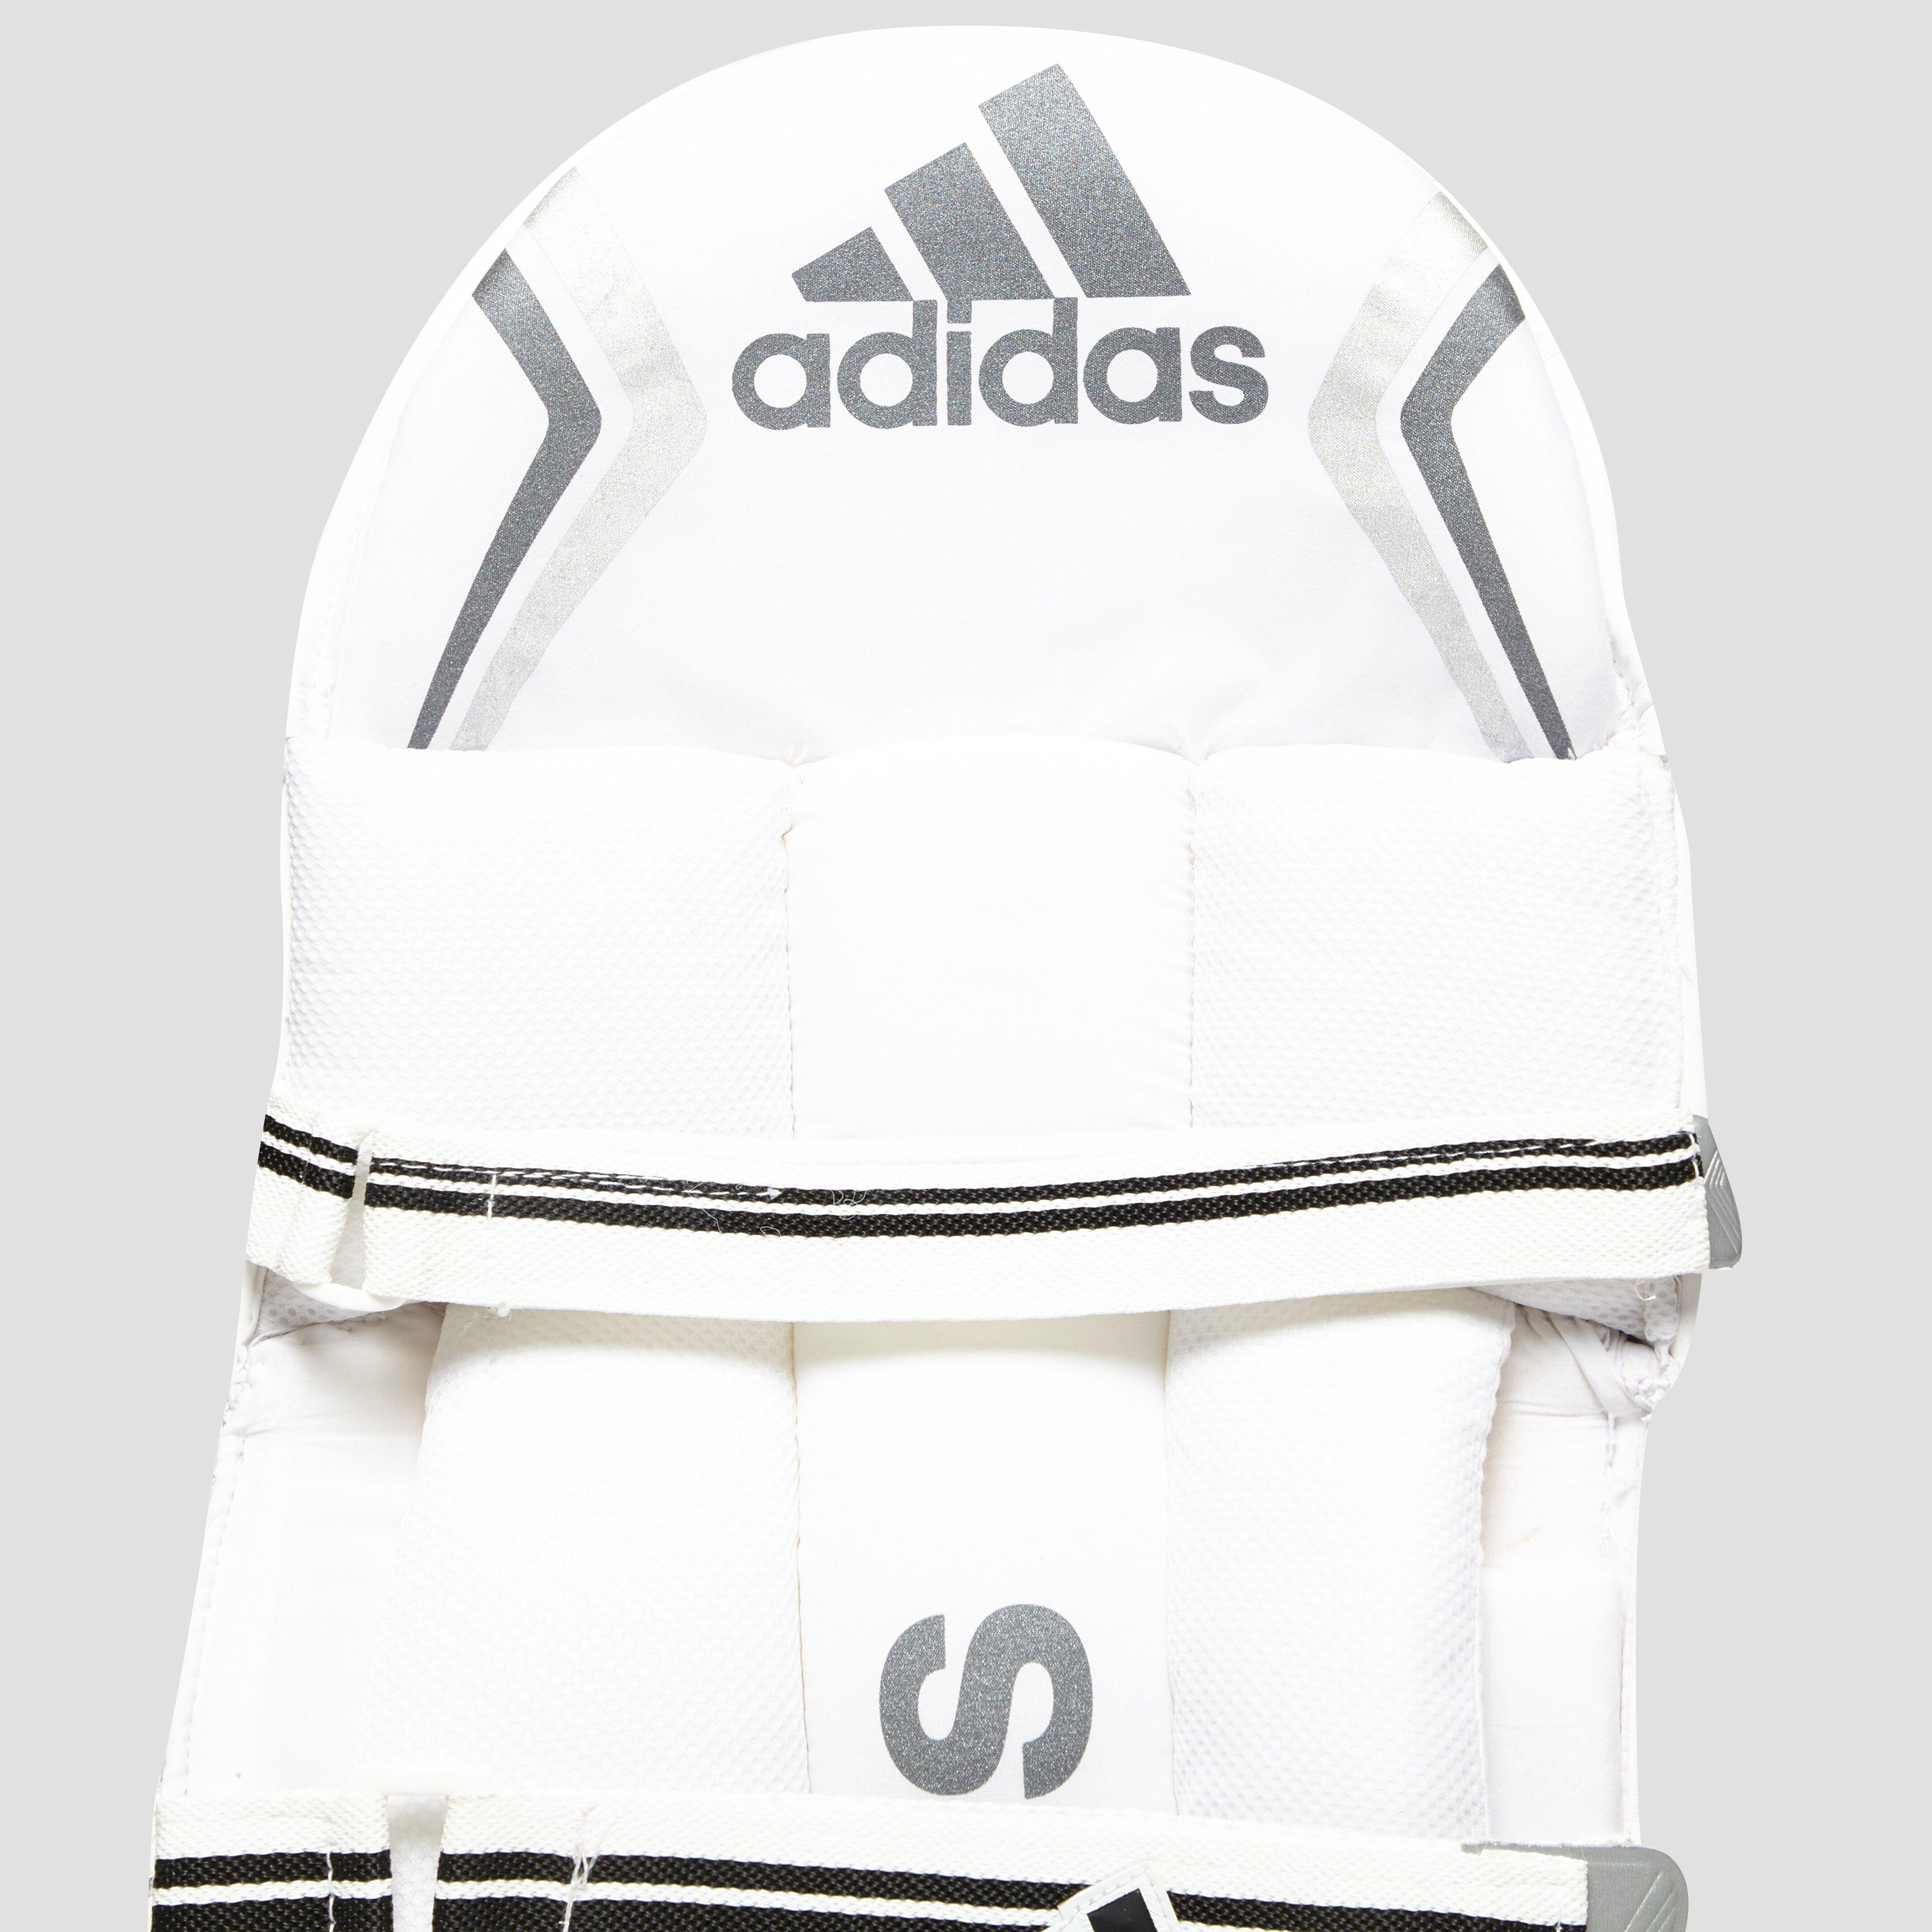 adidas Xt 2.0 Junior Batting Pads